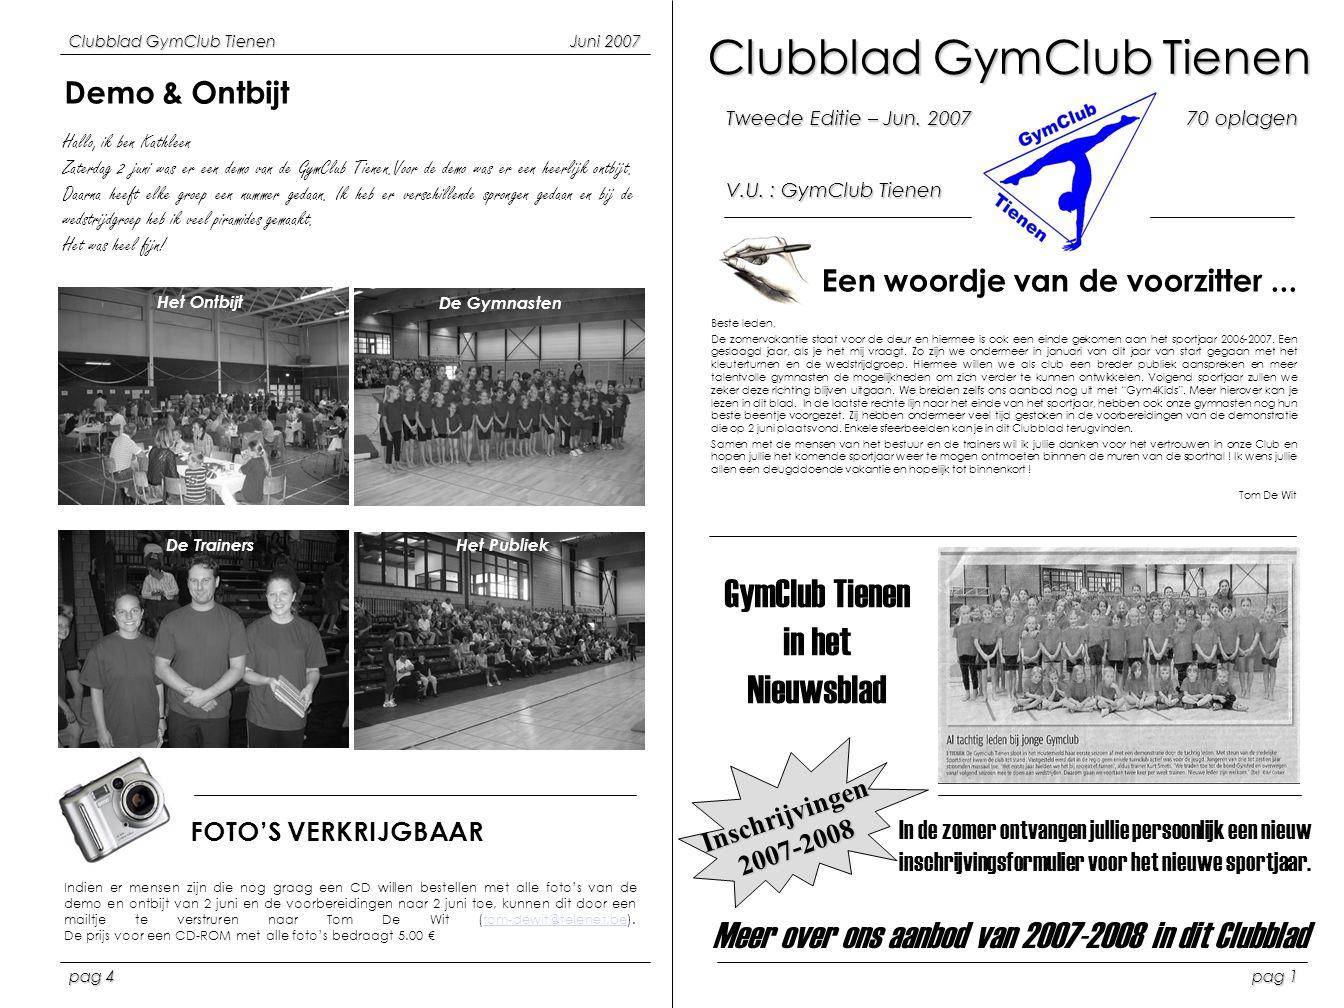 Clubblad GymClub TienenJuni 2007 pag 3 pag 2 Paspoort van onze Trainers...